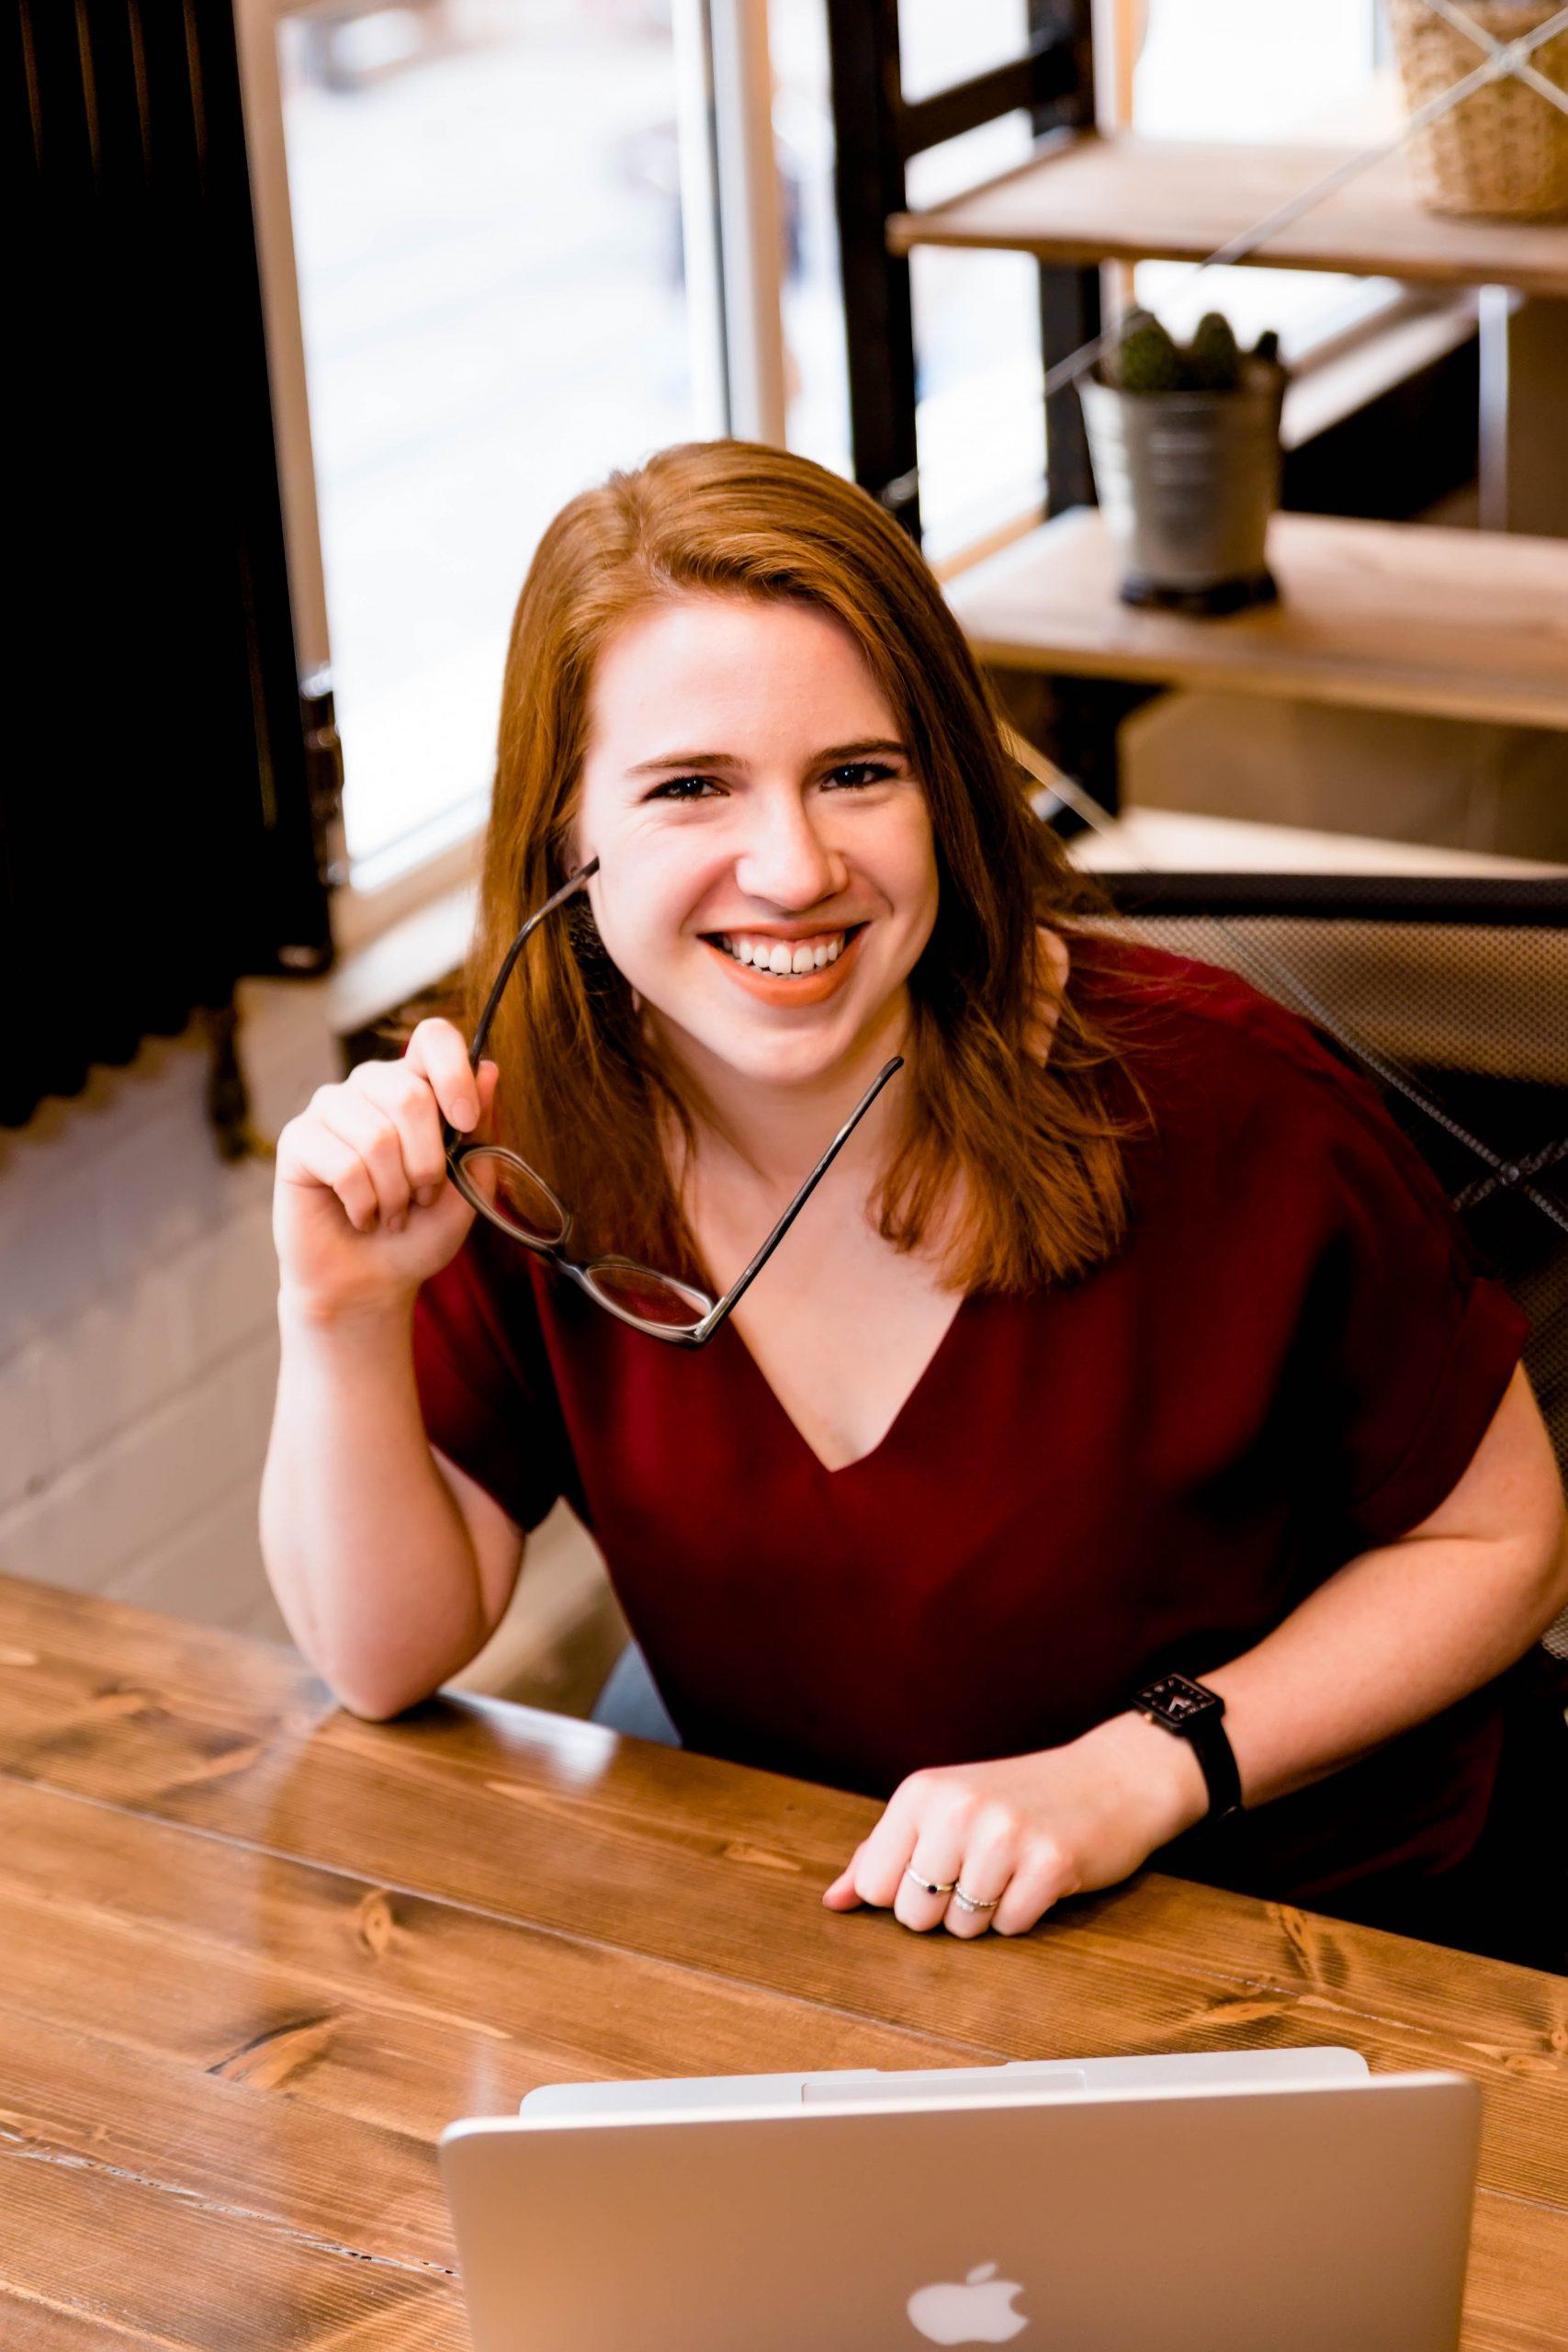 entrepreneur portrait with glasses and laptop